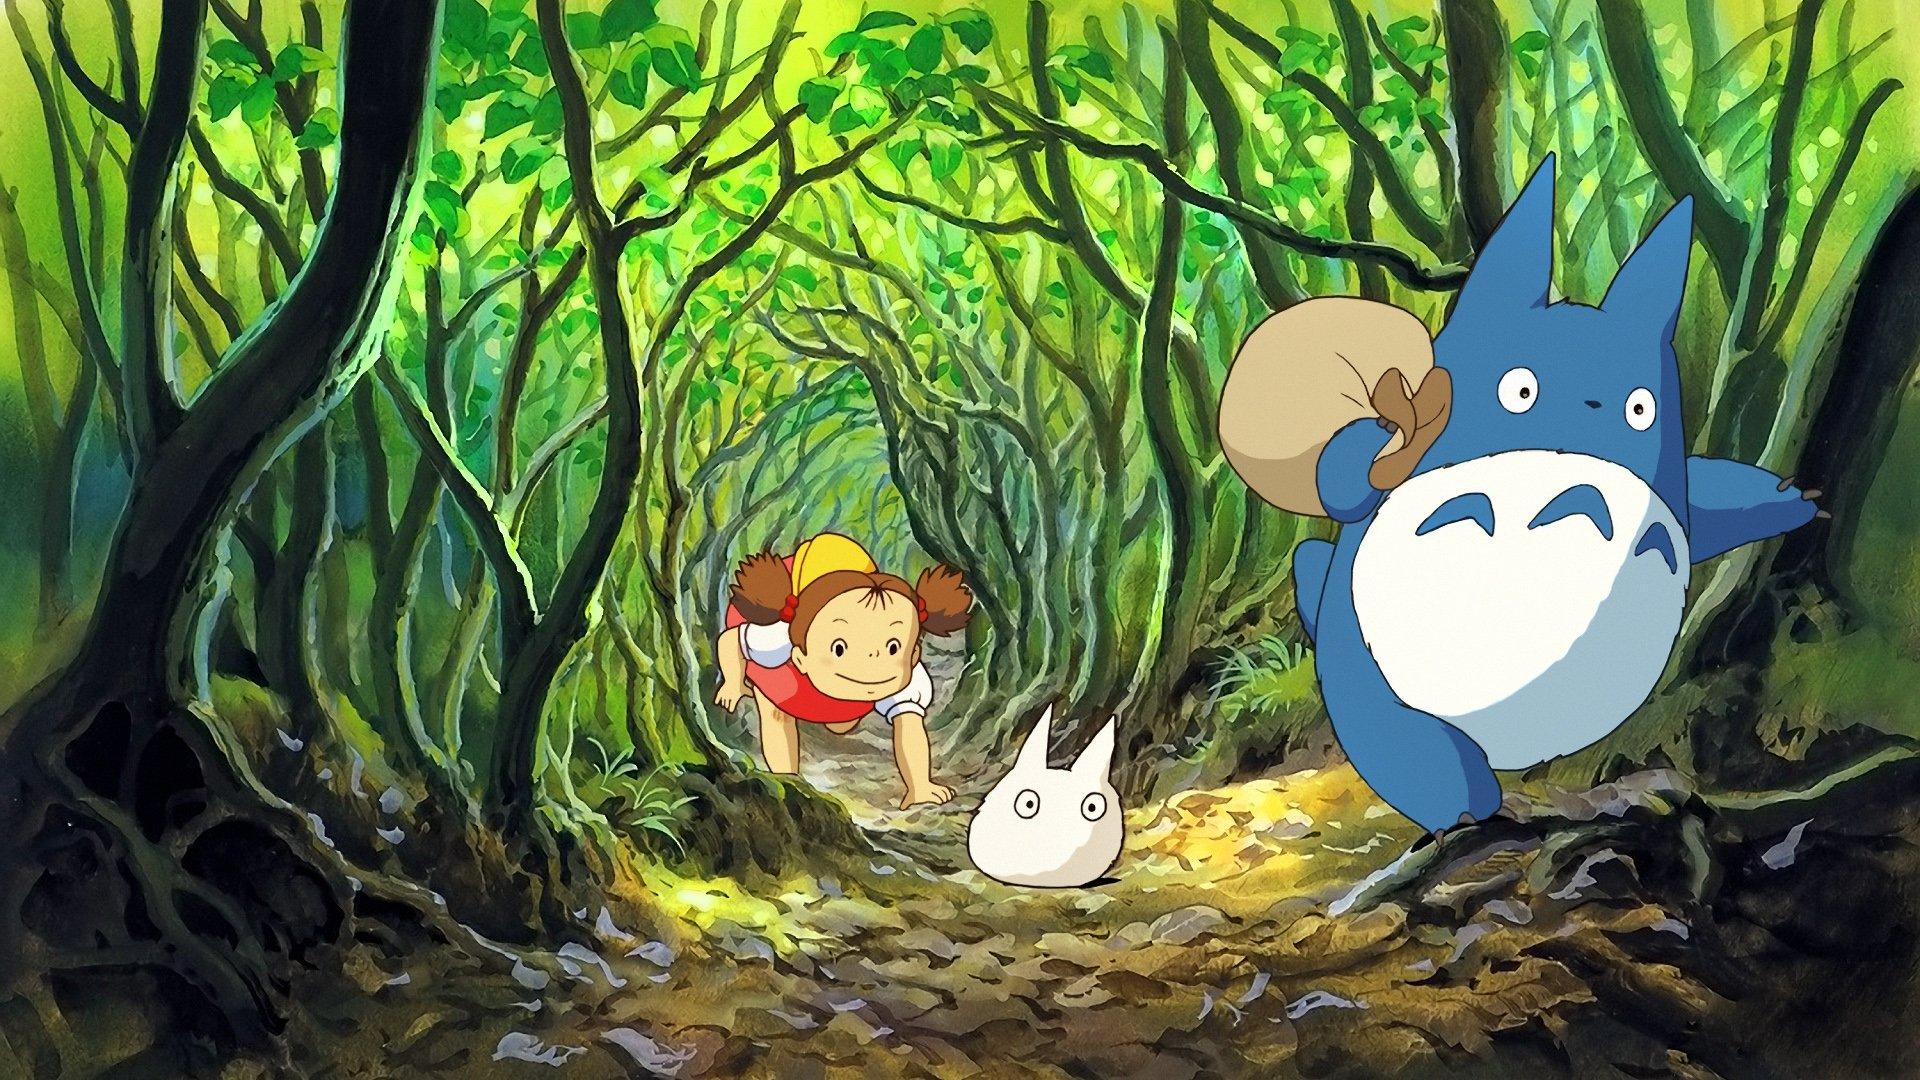 Totoro Studio Ghibli wallpaper 1920x1080 288586 WallpaperUP 1920x1080